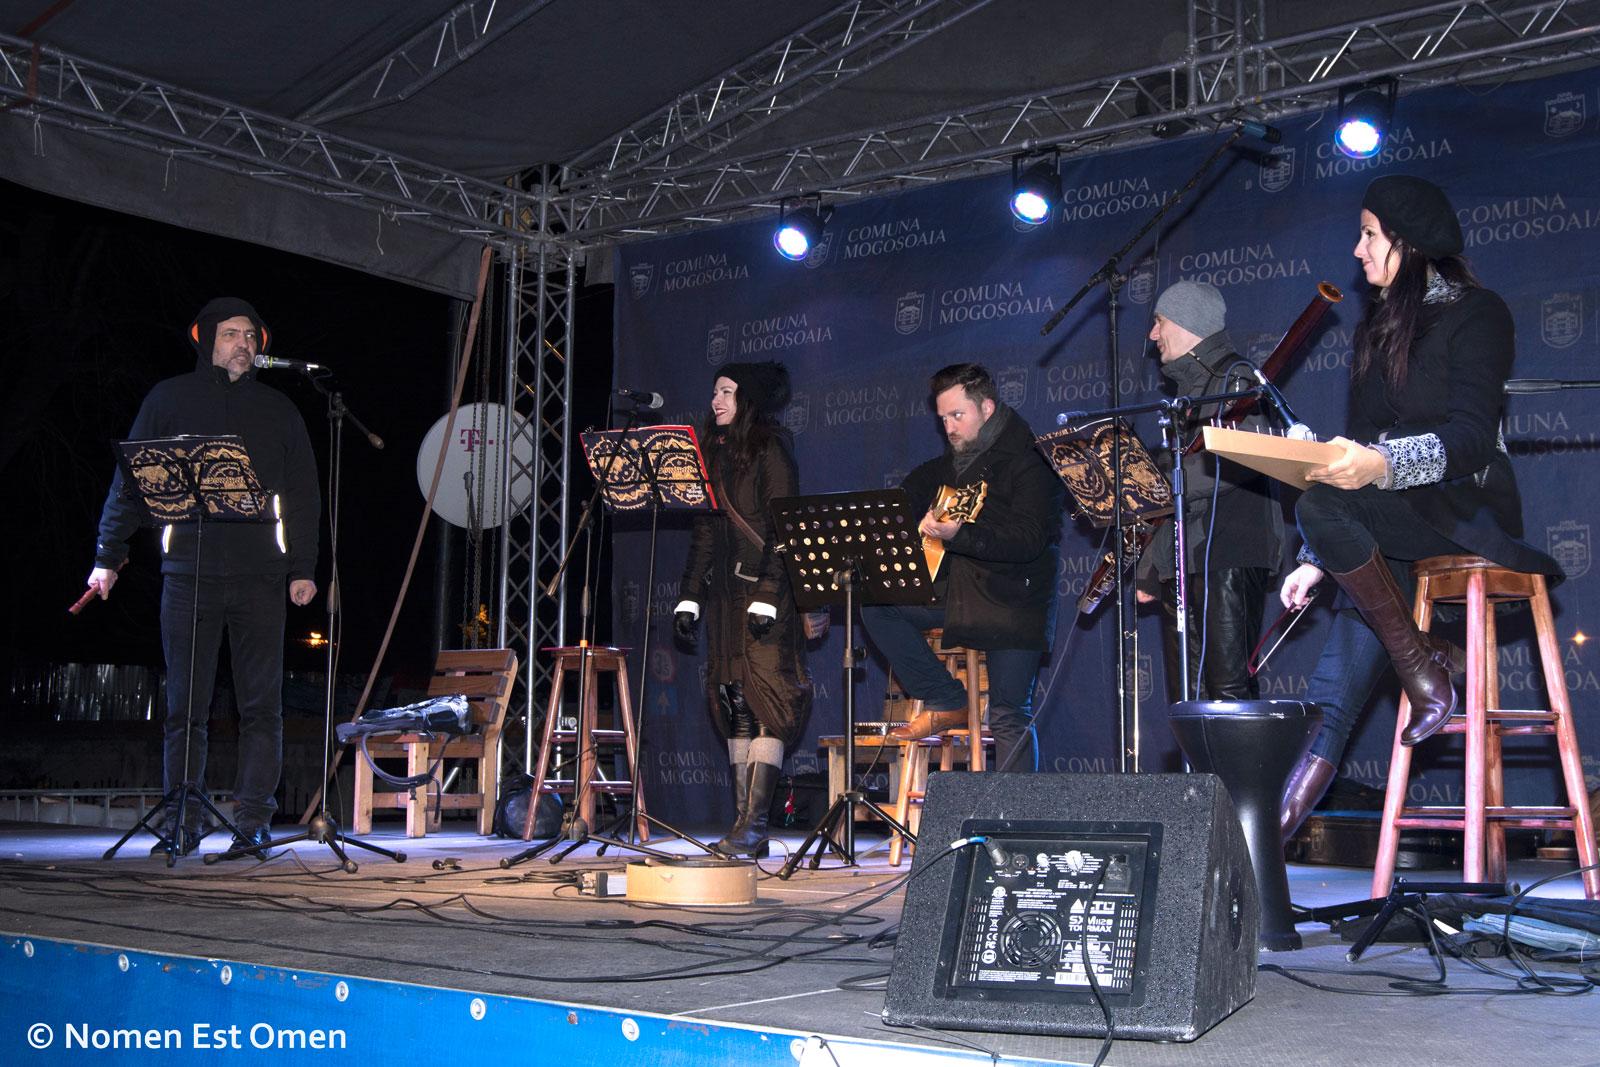 Nomen Est Omen concert iarna